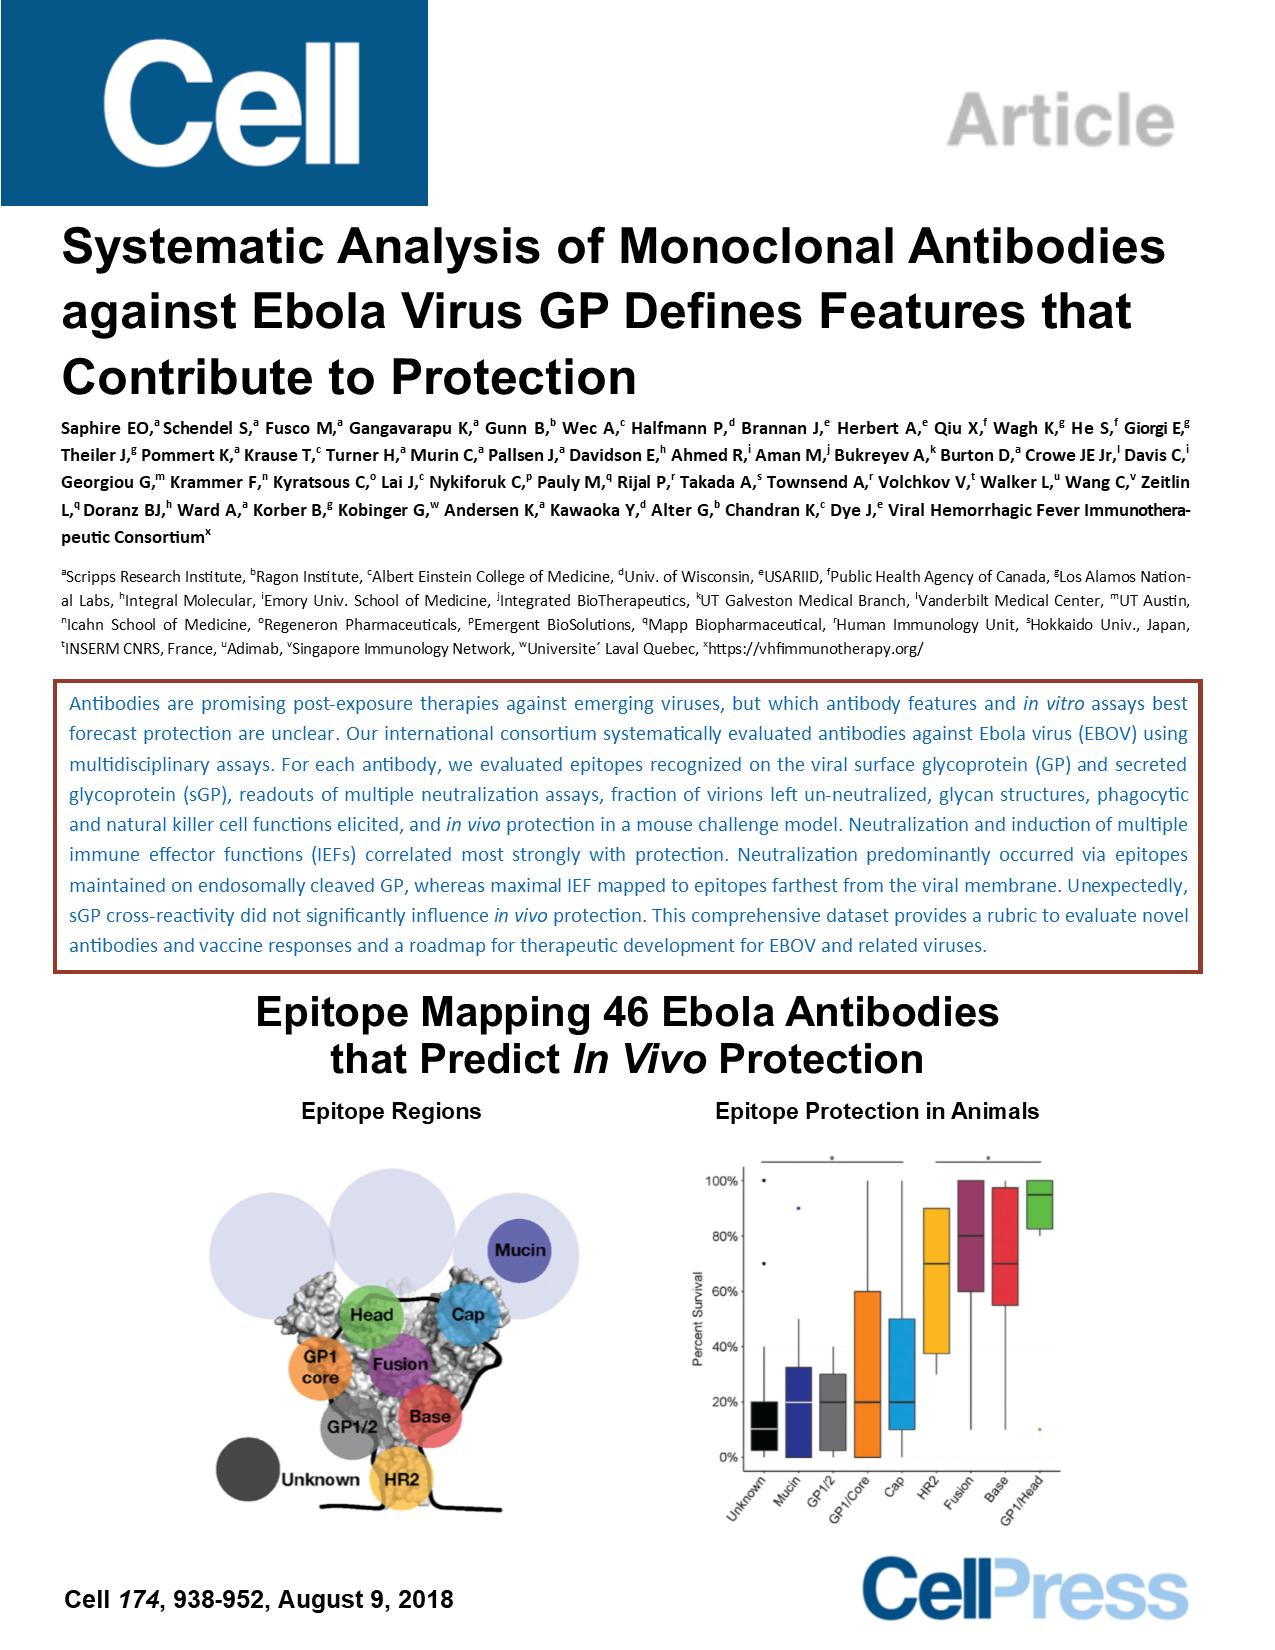 2018_Cell_Saphire_Ebola-MAb-Analysis_090518_Final